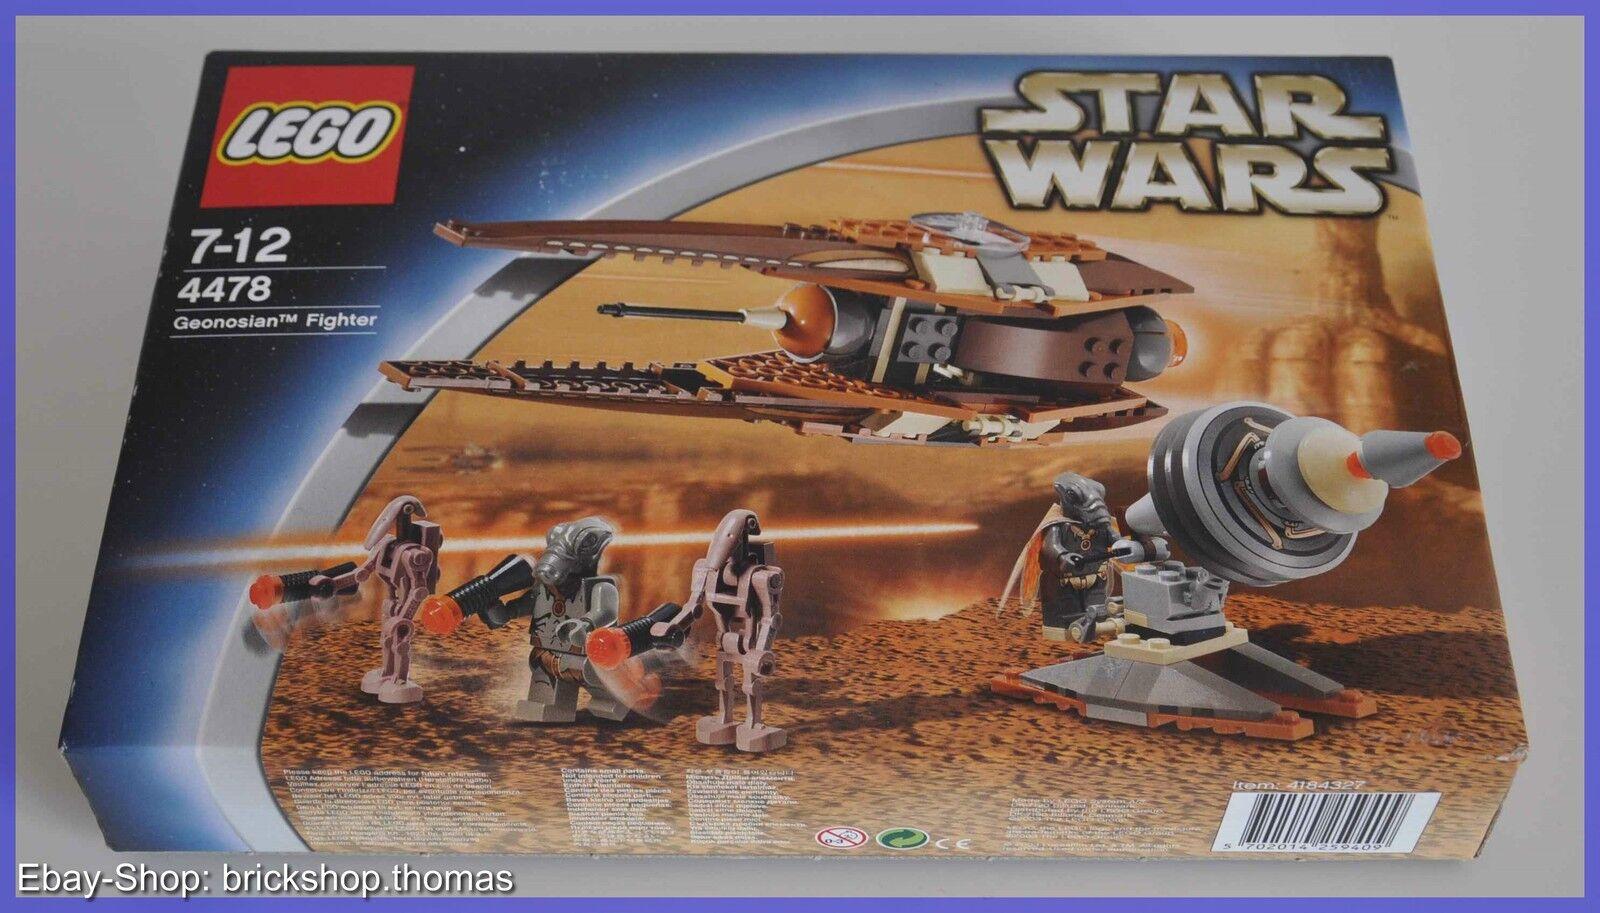 Dans l'attente de la la la ville, retenant votre souffle LEGO star wars 4478-GEONOSIAN FIGHTER-NEUF emballage d'origine ba9a21